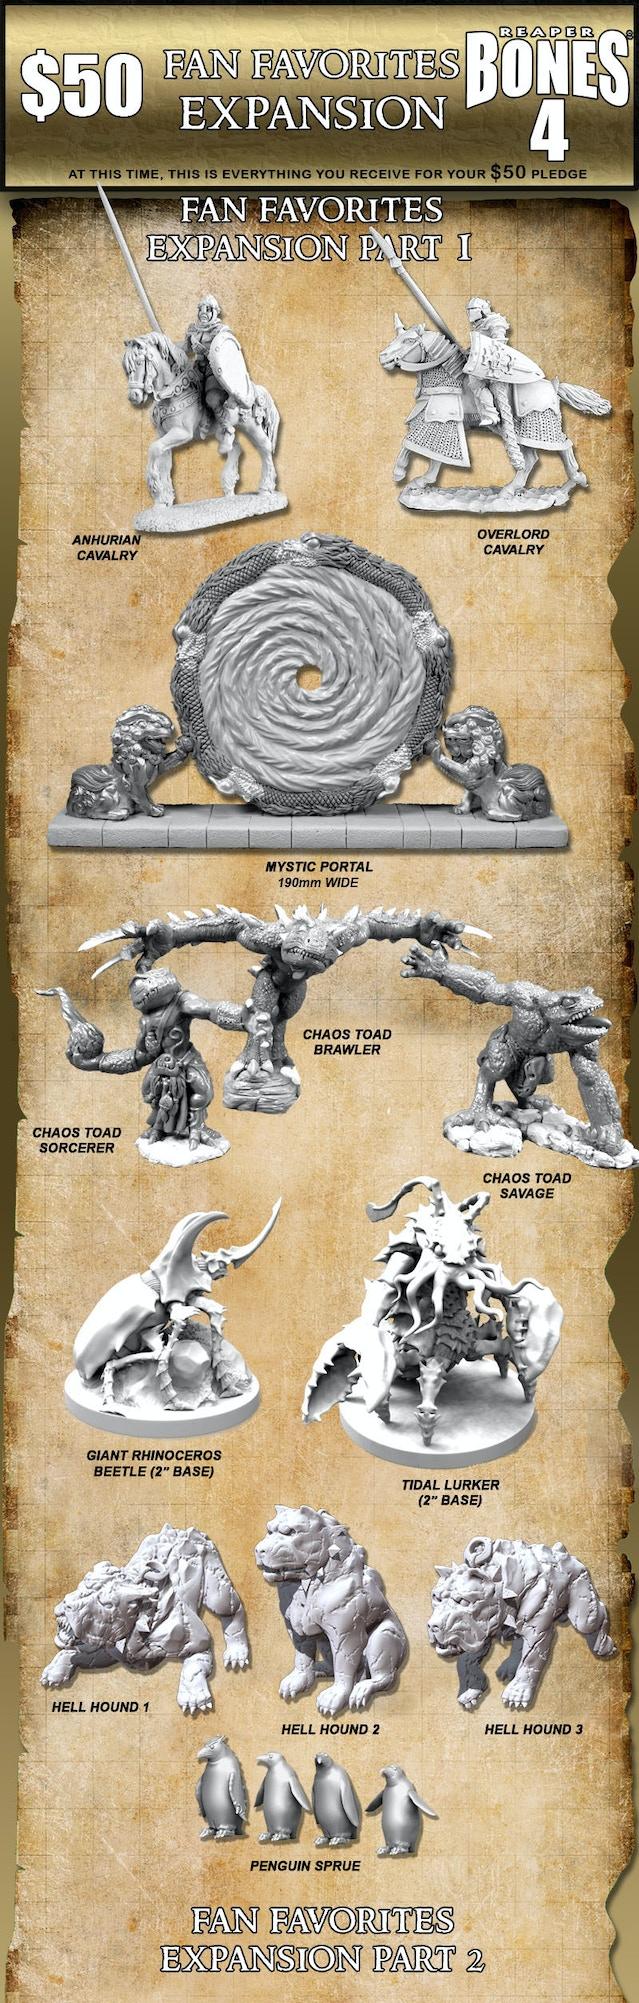 Reaper Miniatures Bones 4 Mr Bones Epic Adventure By